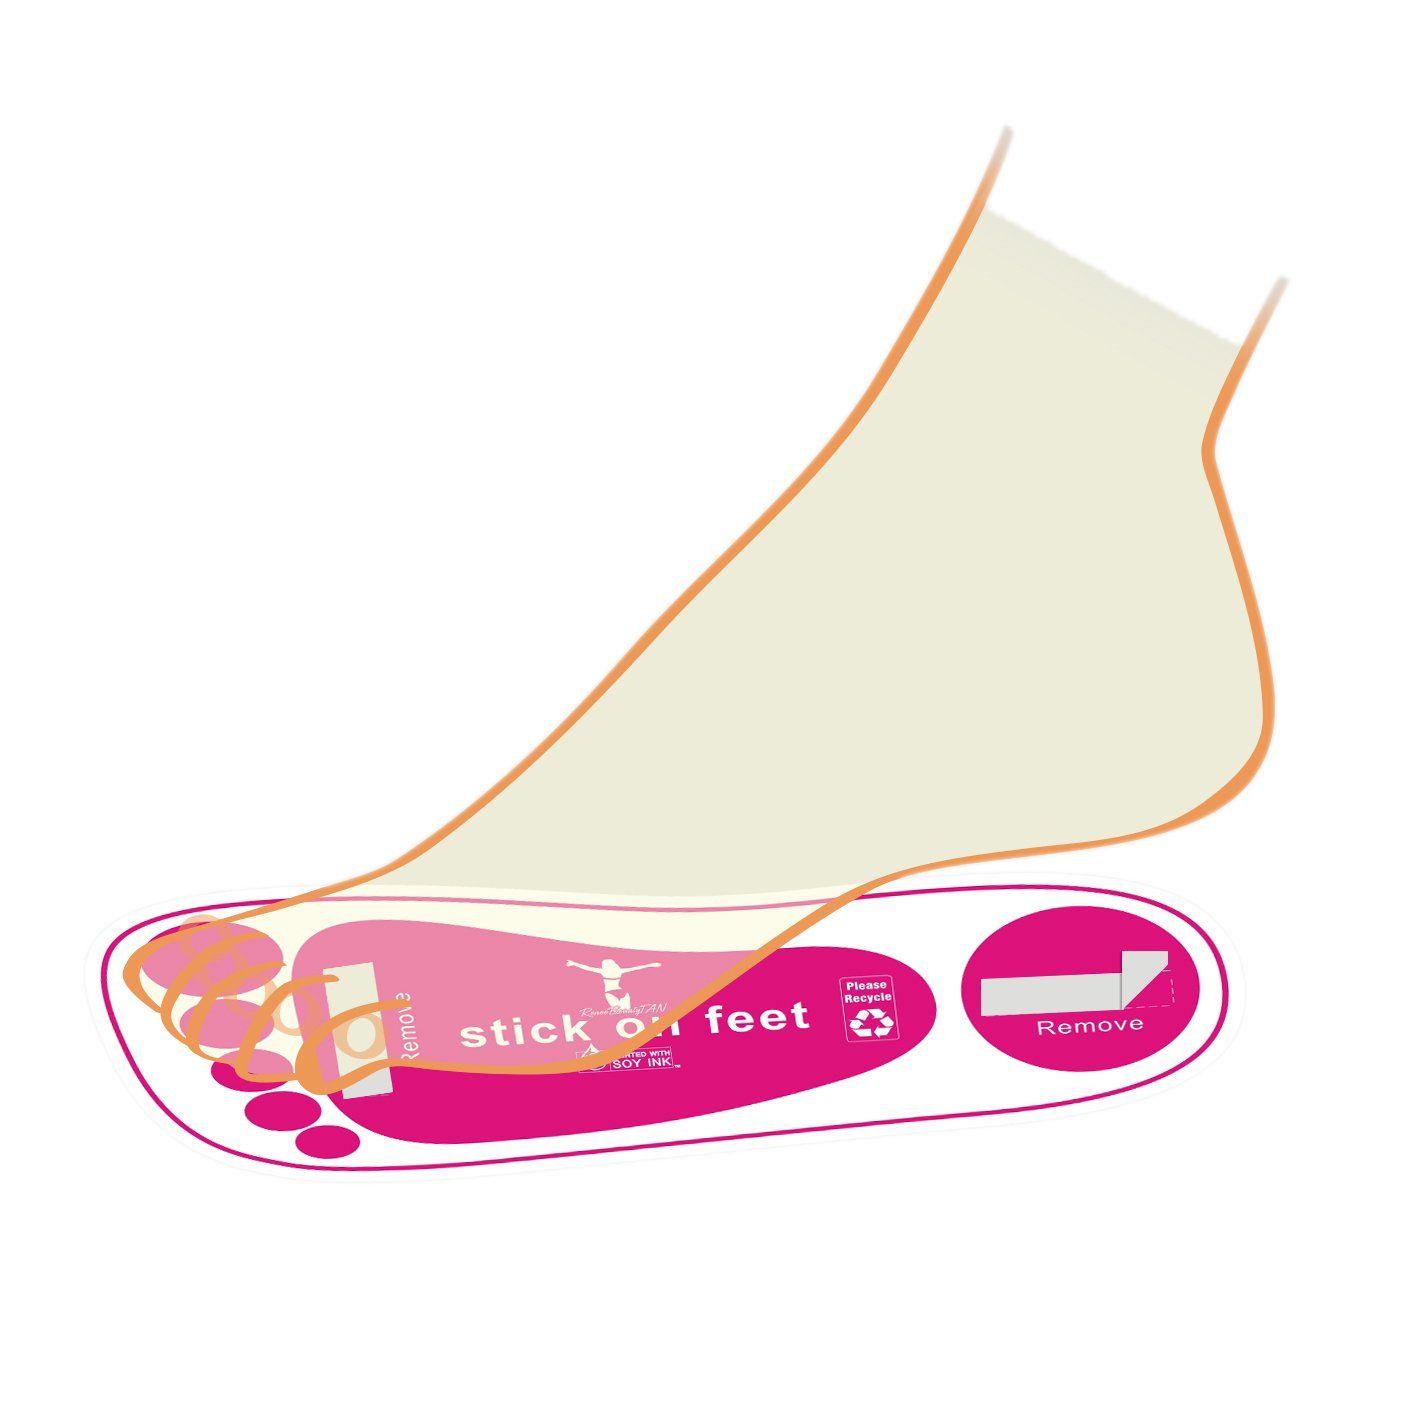 Economy 60pairs(120feets Pink Spray Tanning Feet Stick